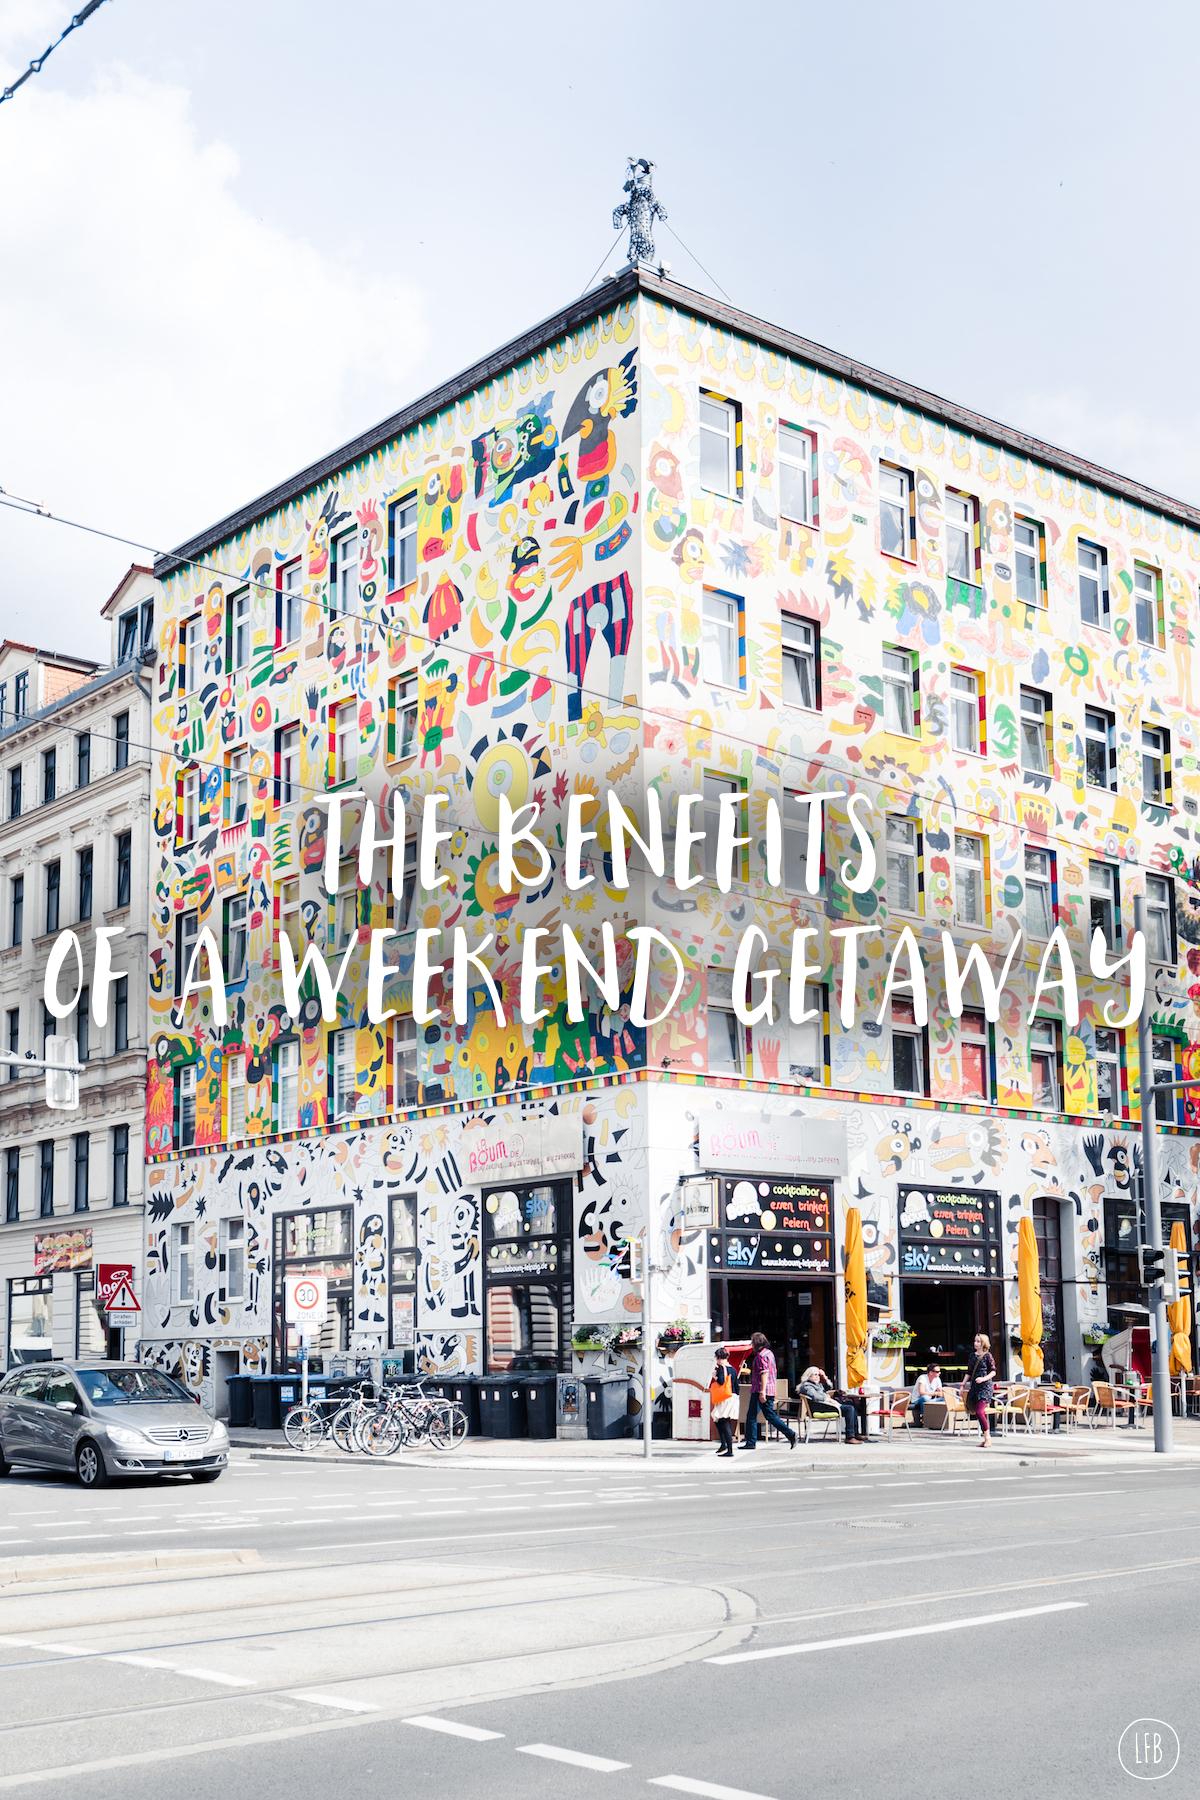 The Benefits of a Weekend Getaway - lovefromberlin.net